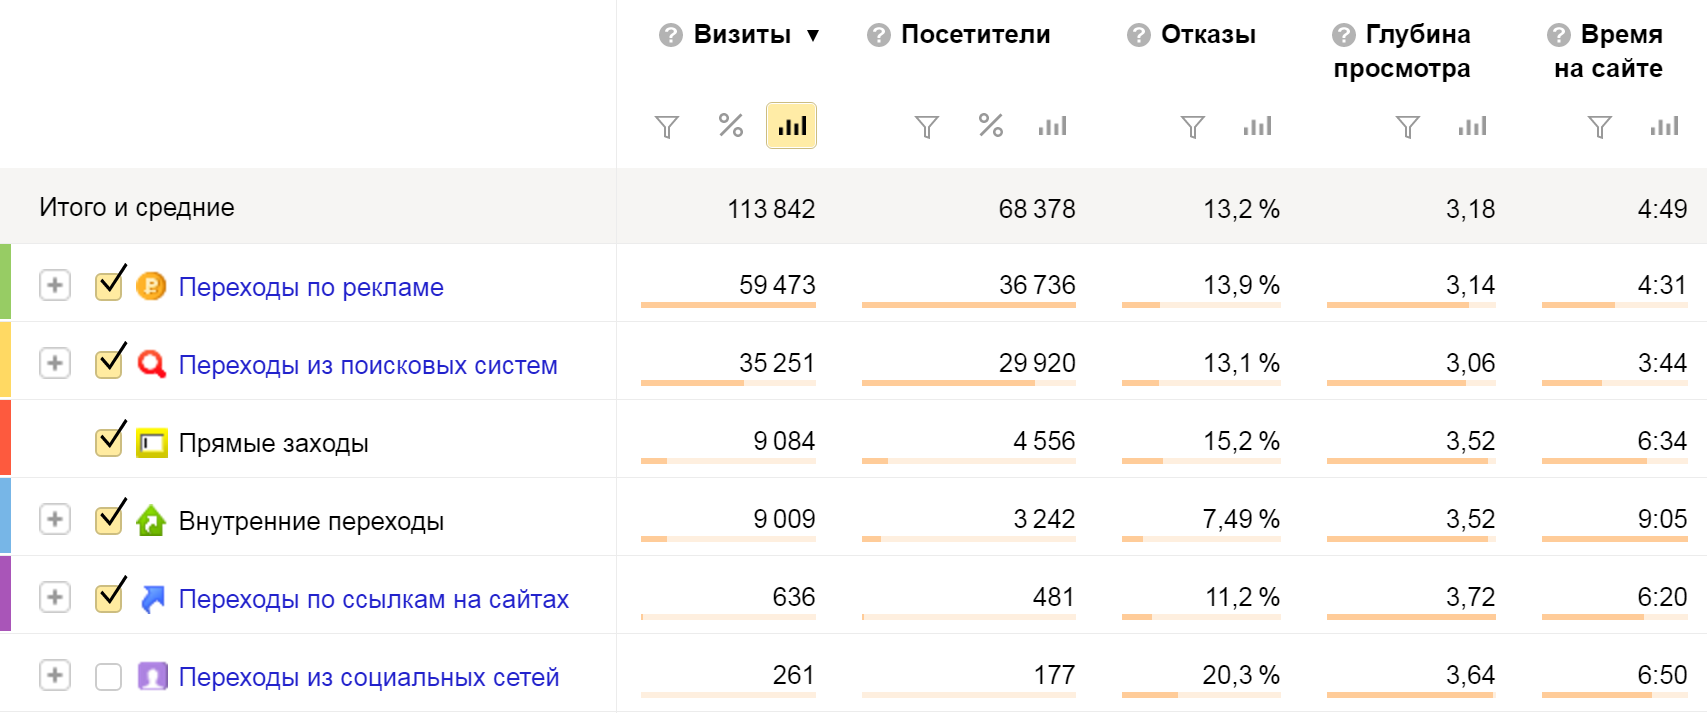 Статистика сайта по источникам трафика